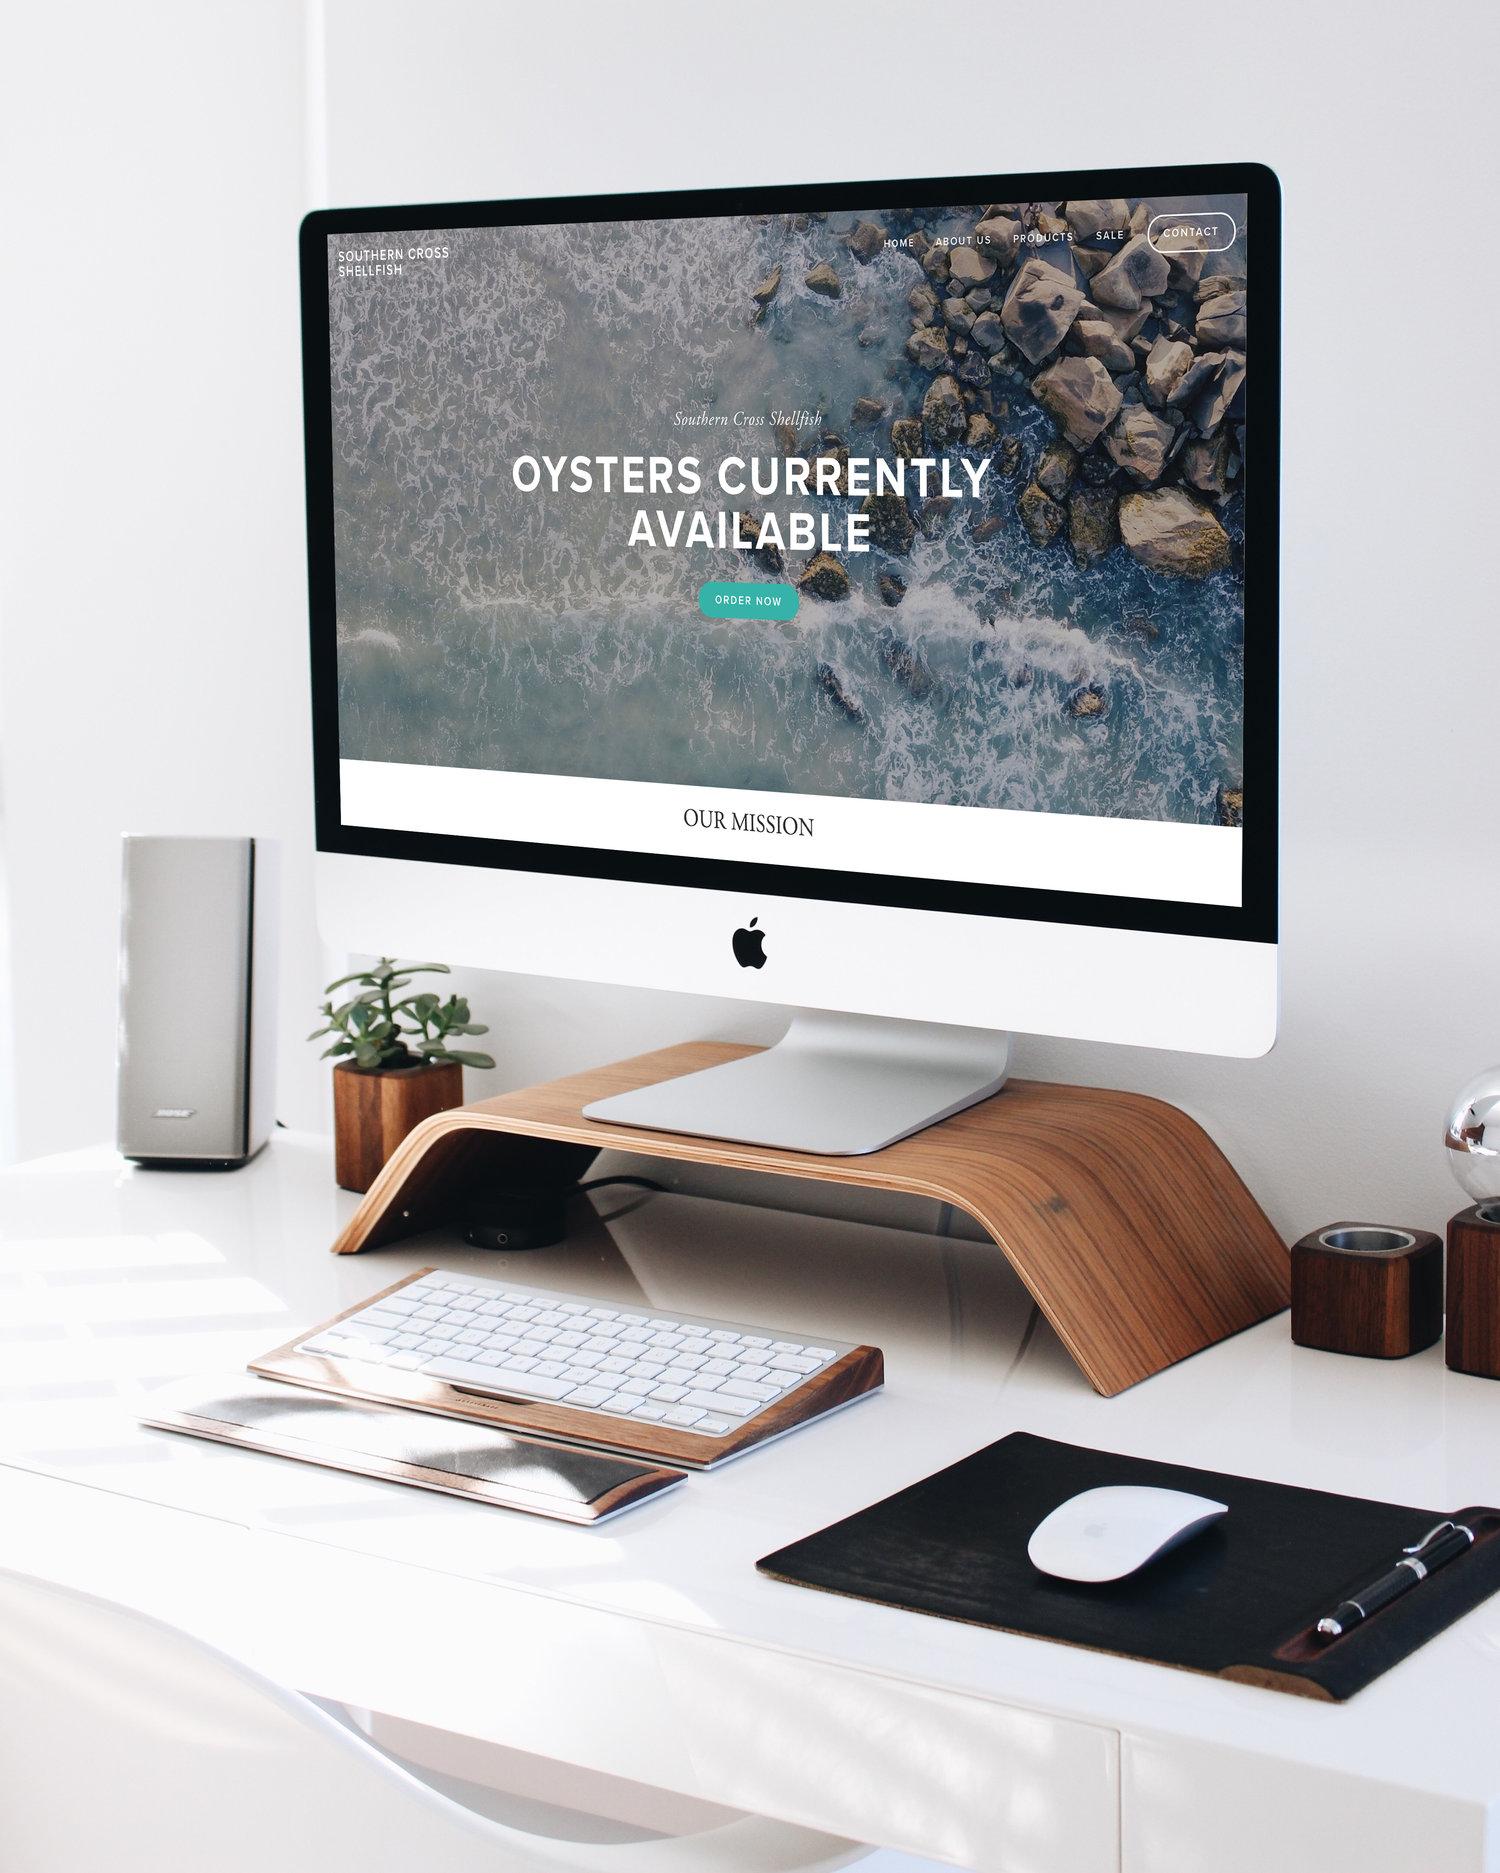 Website design for Southern Cross Shellfish